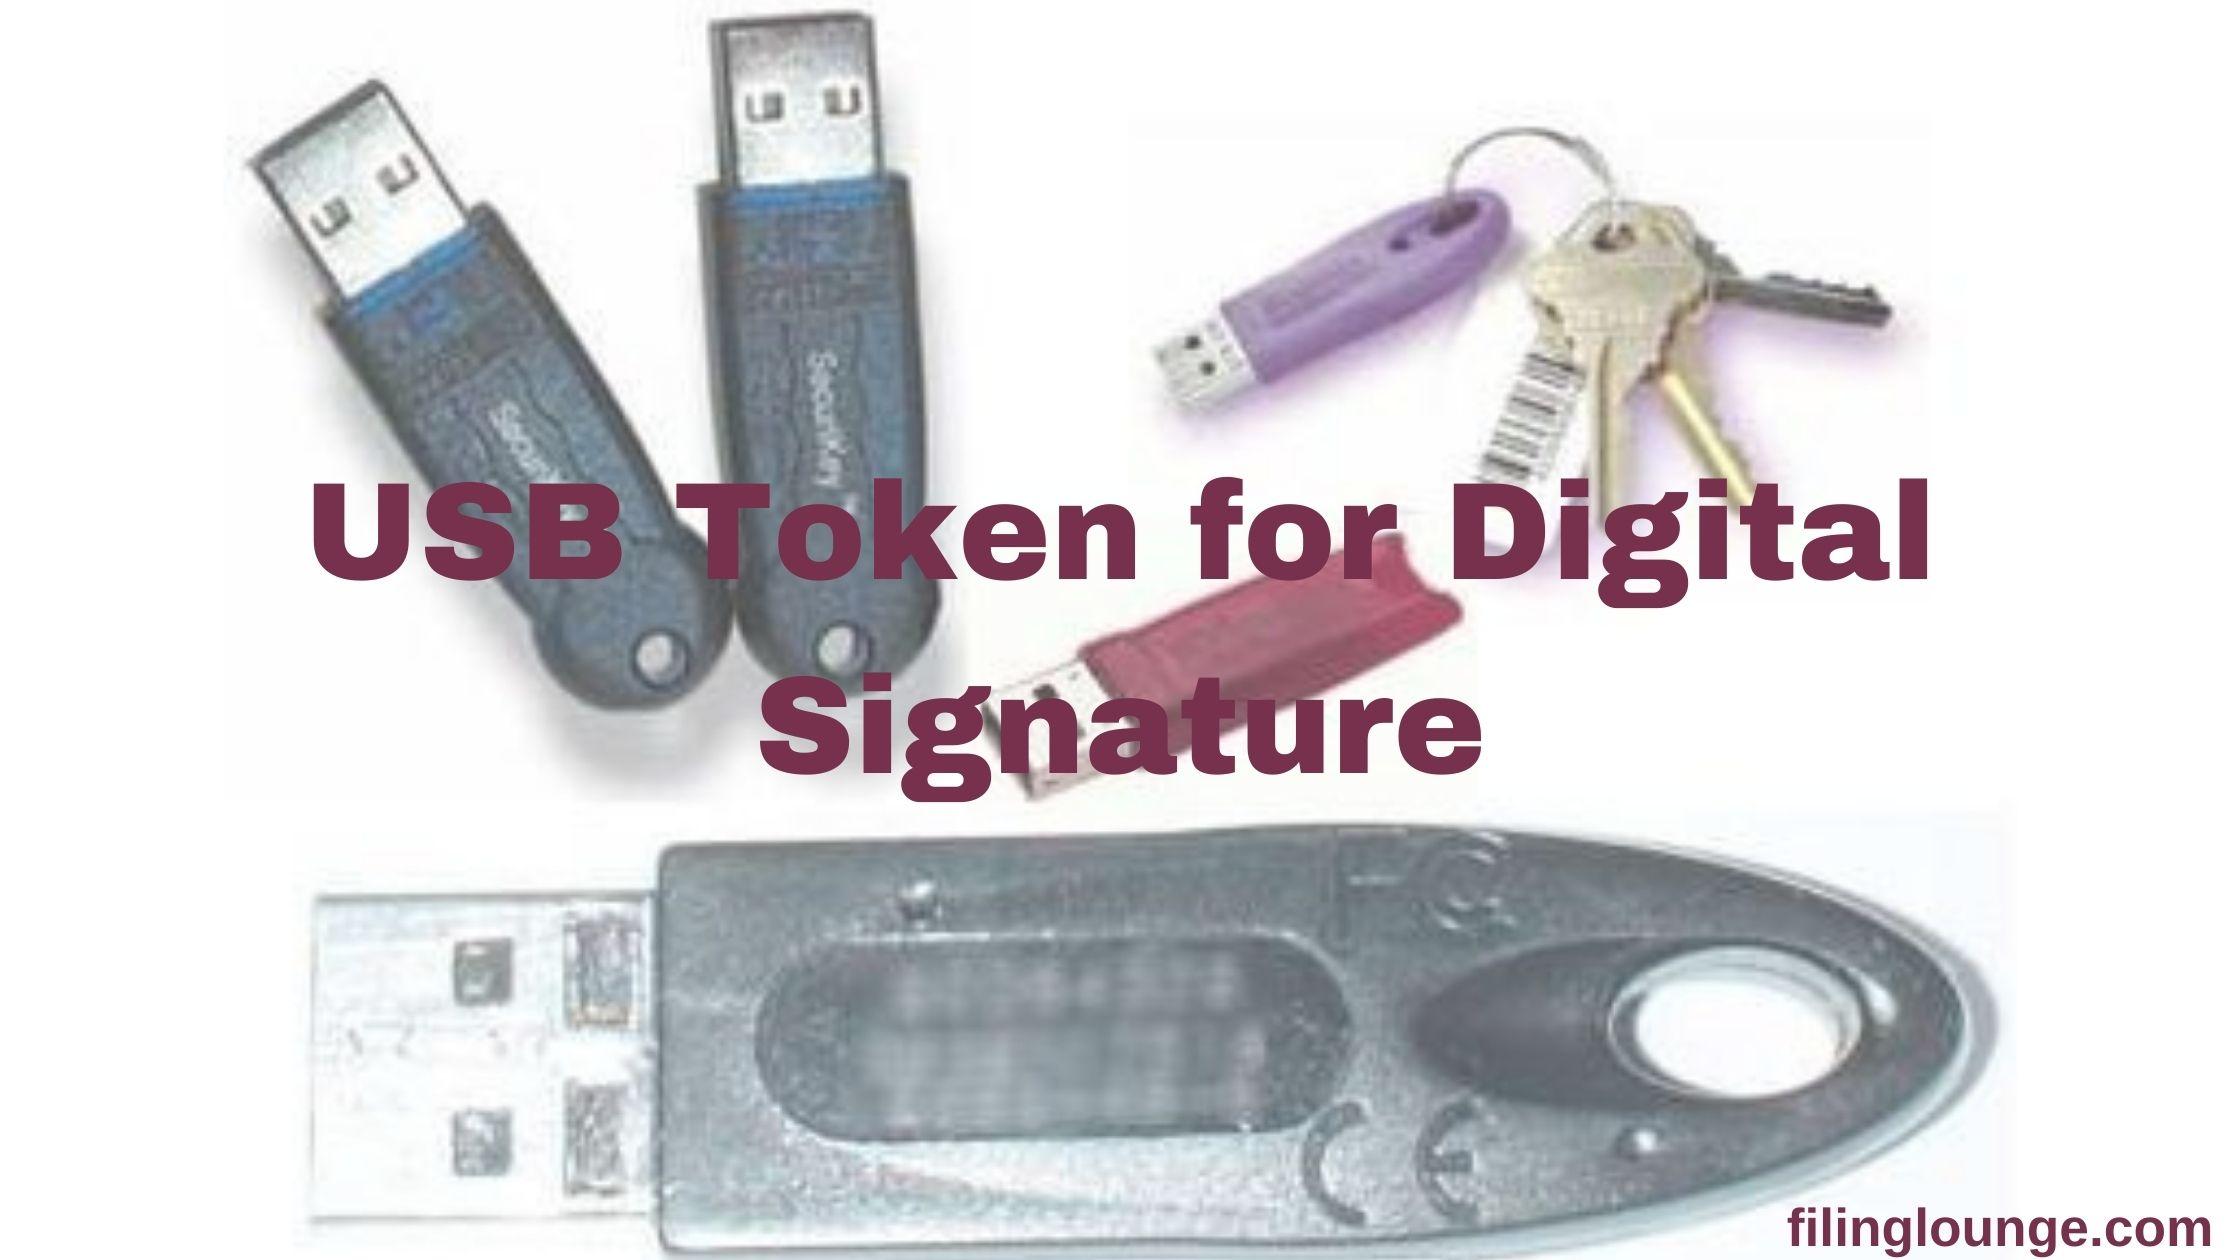 USB Token for Digital Signature